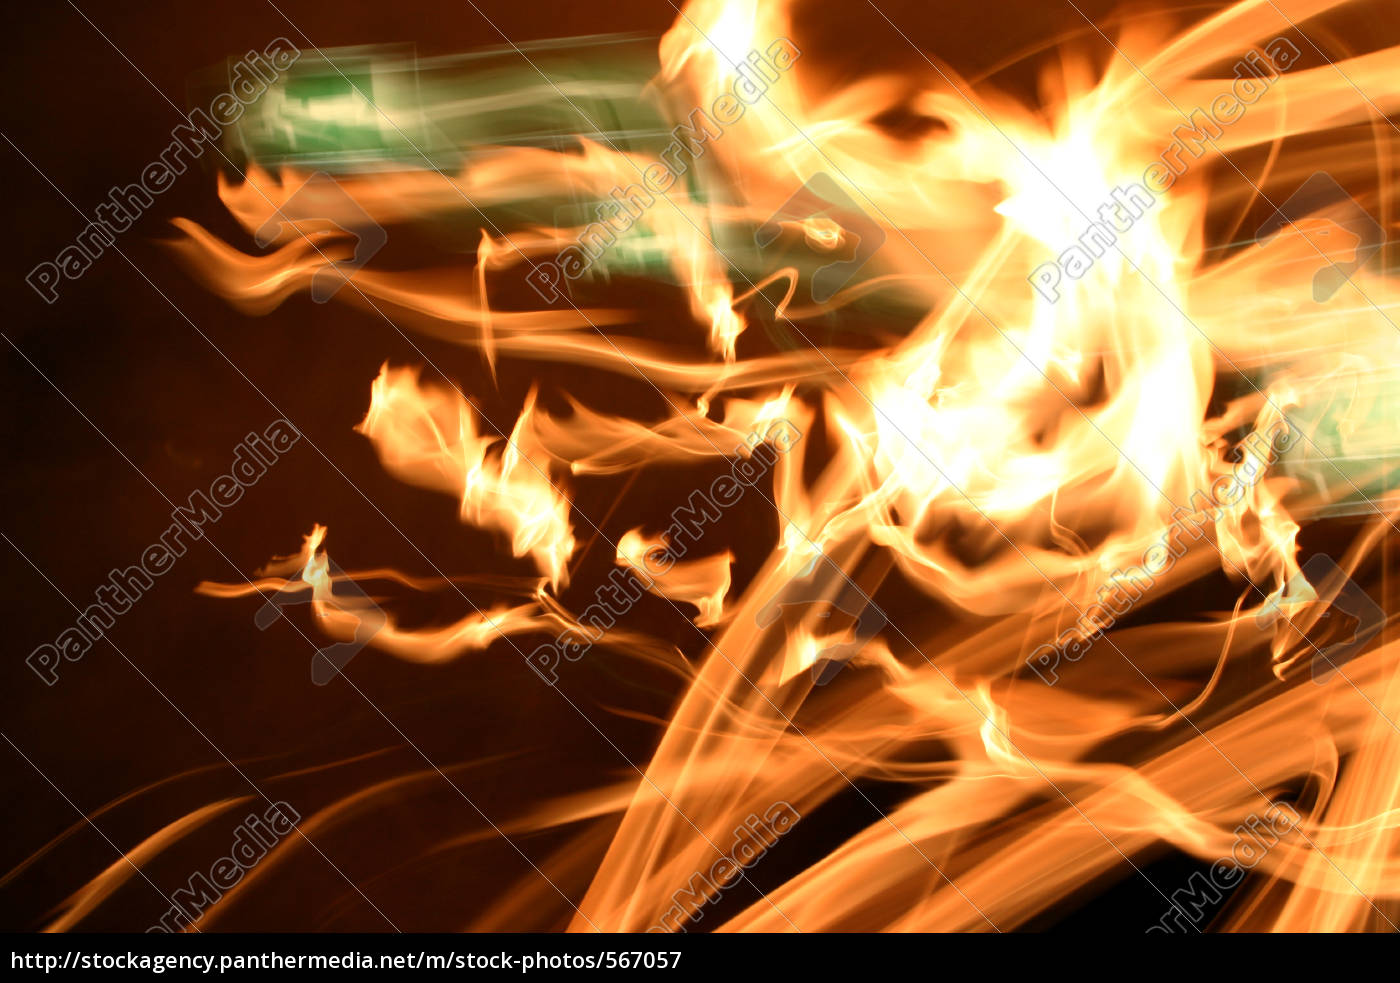 flame - 567057